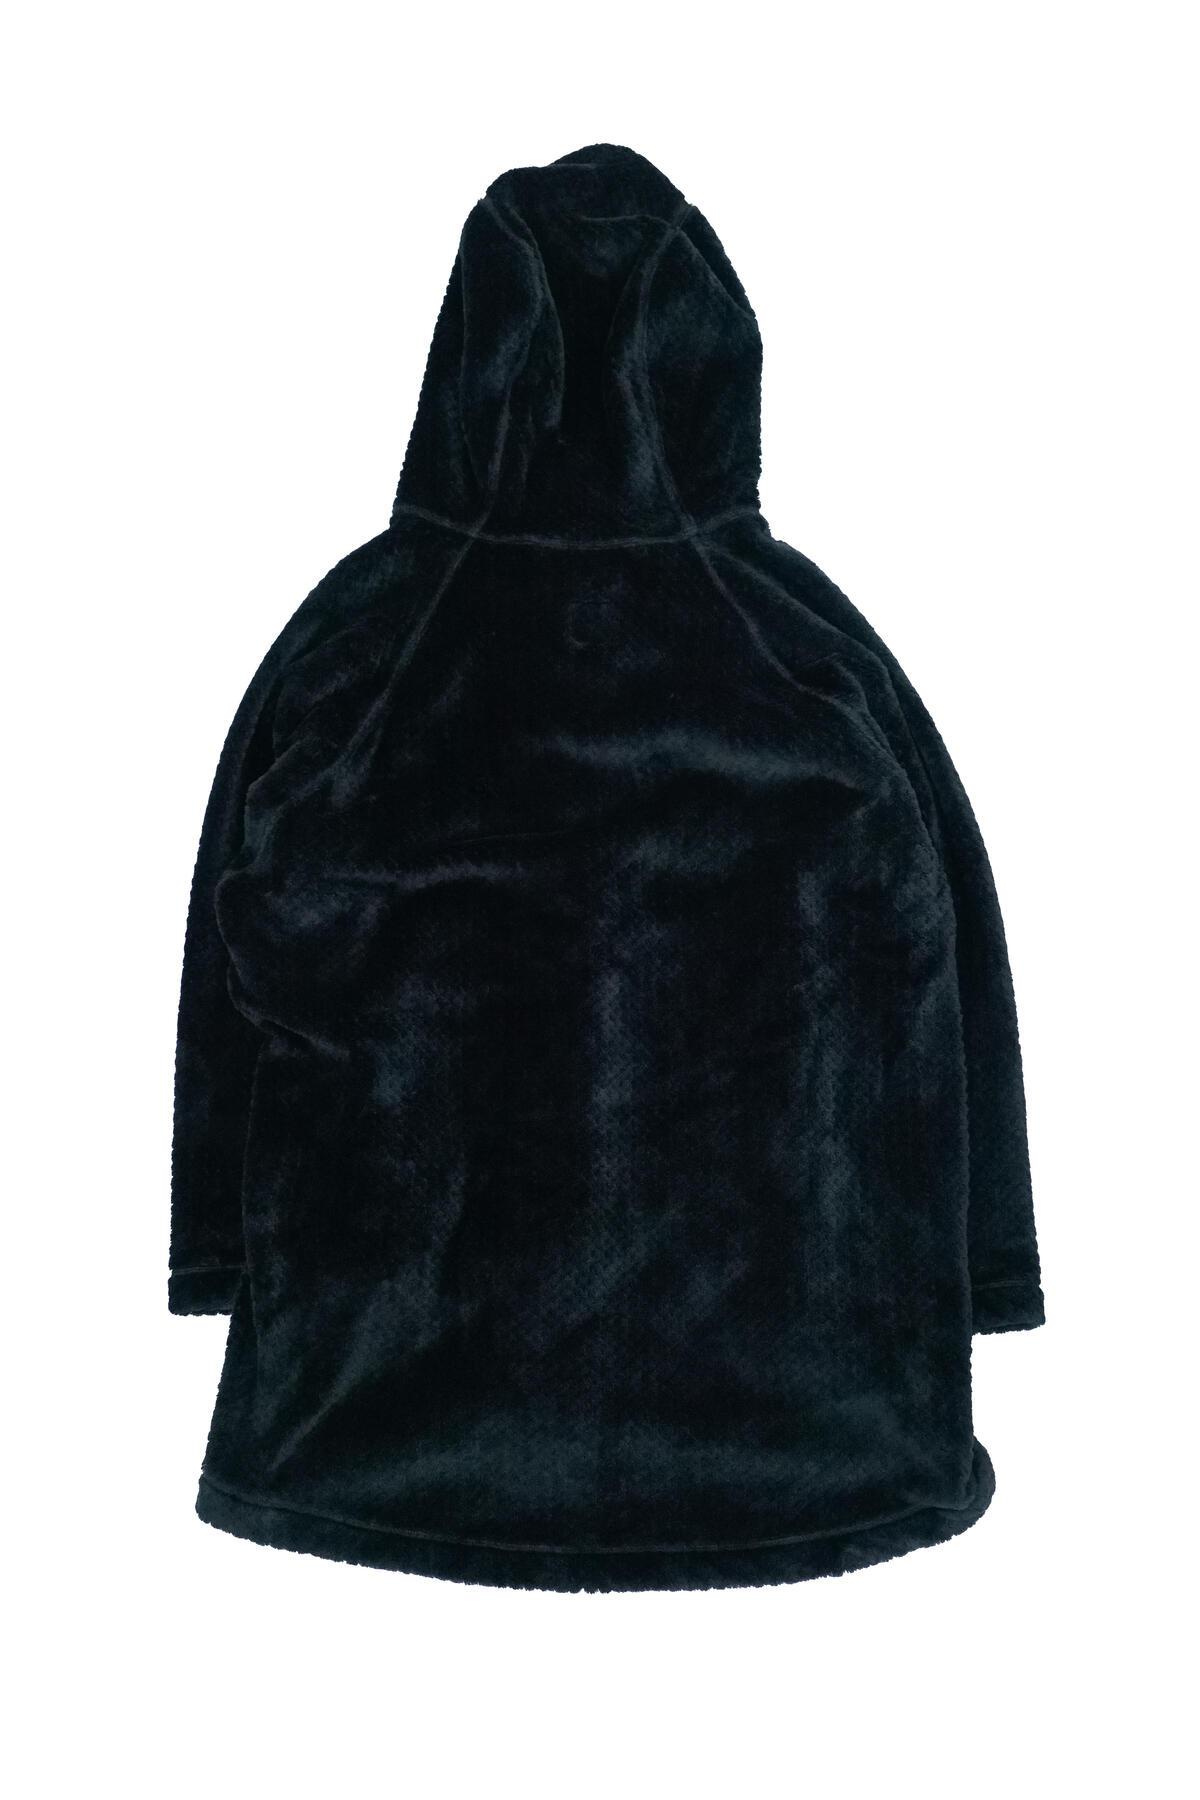 RXMF20ROX-10 BLACK back